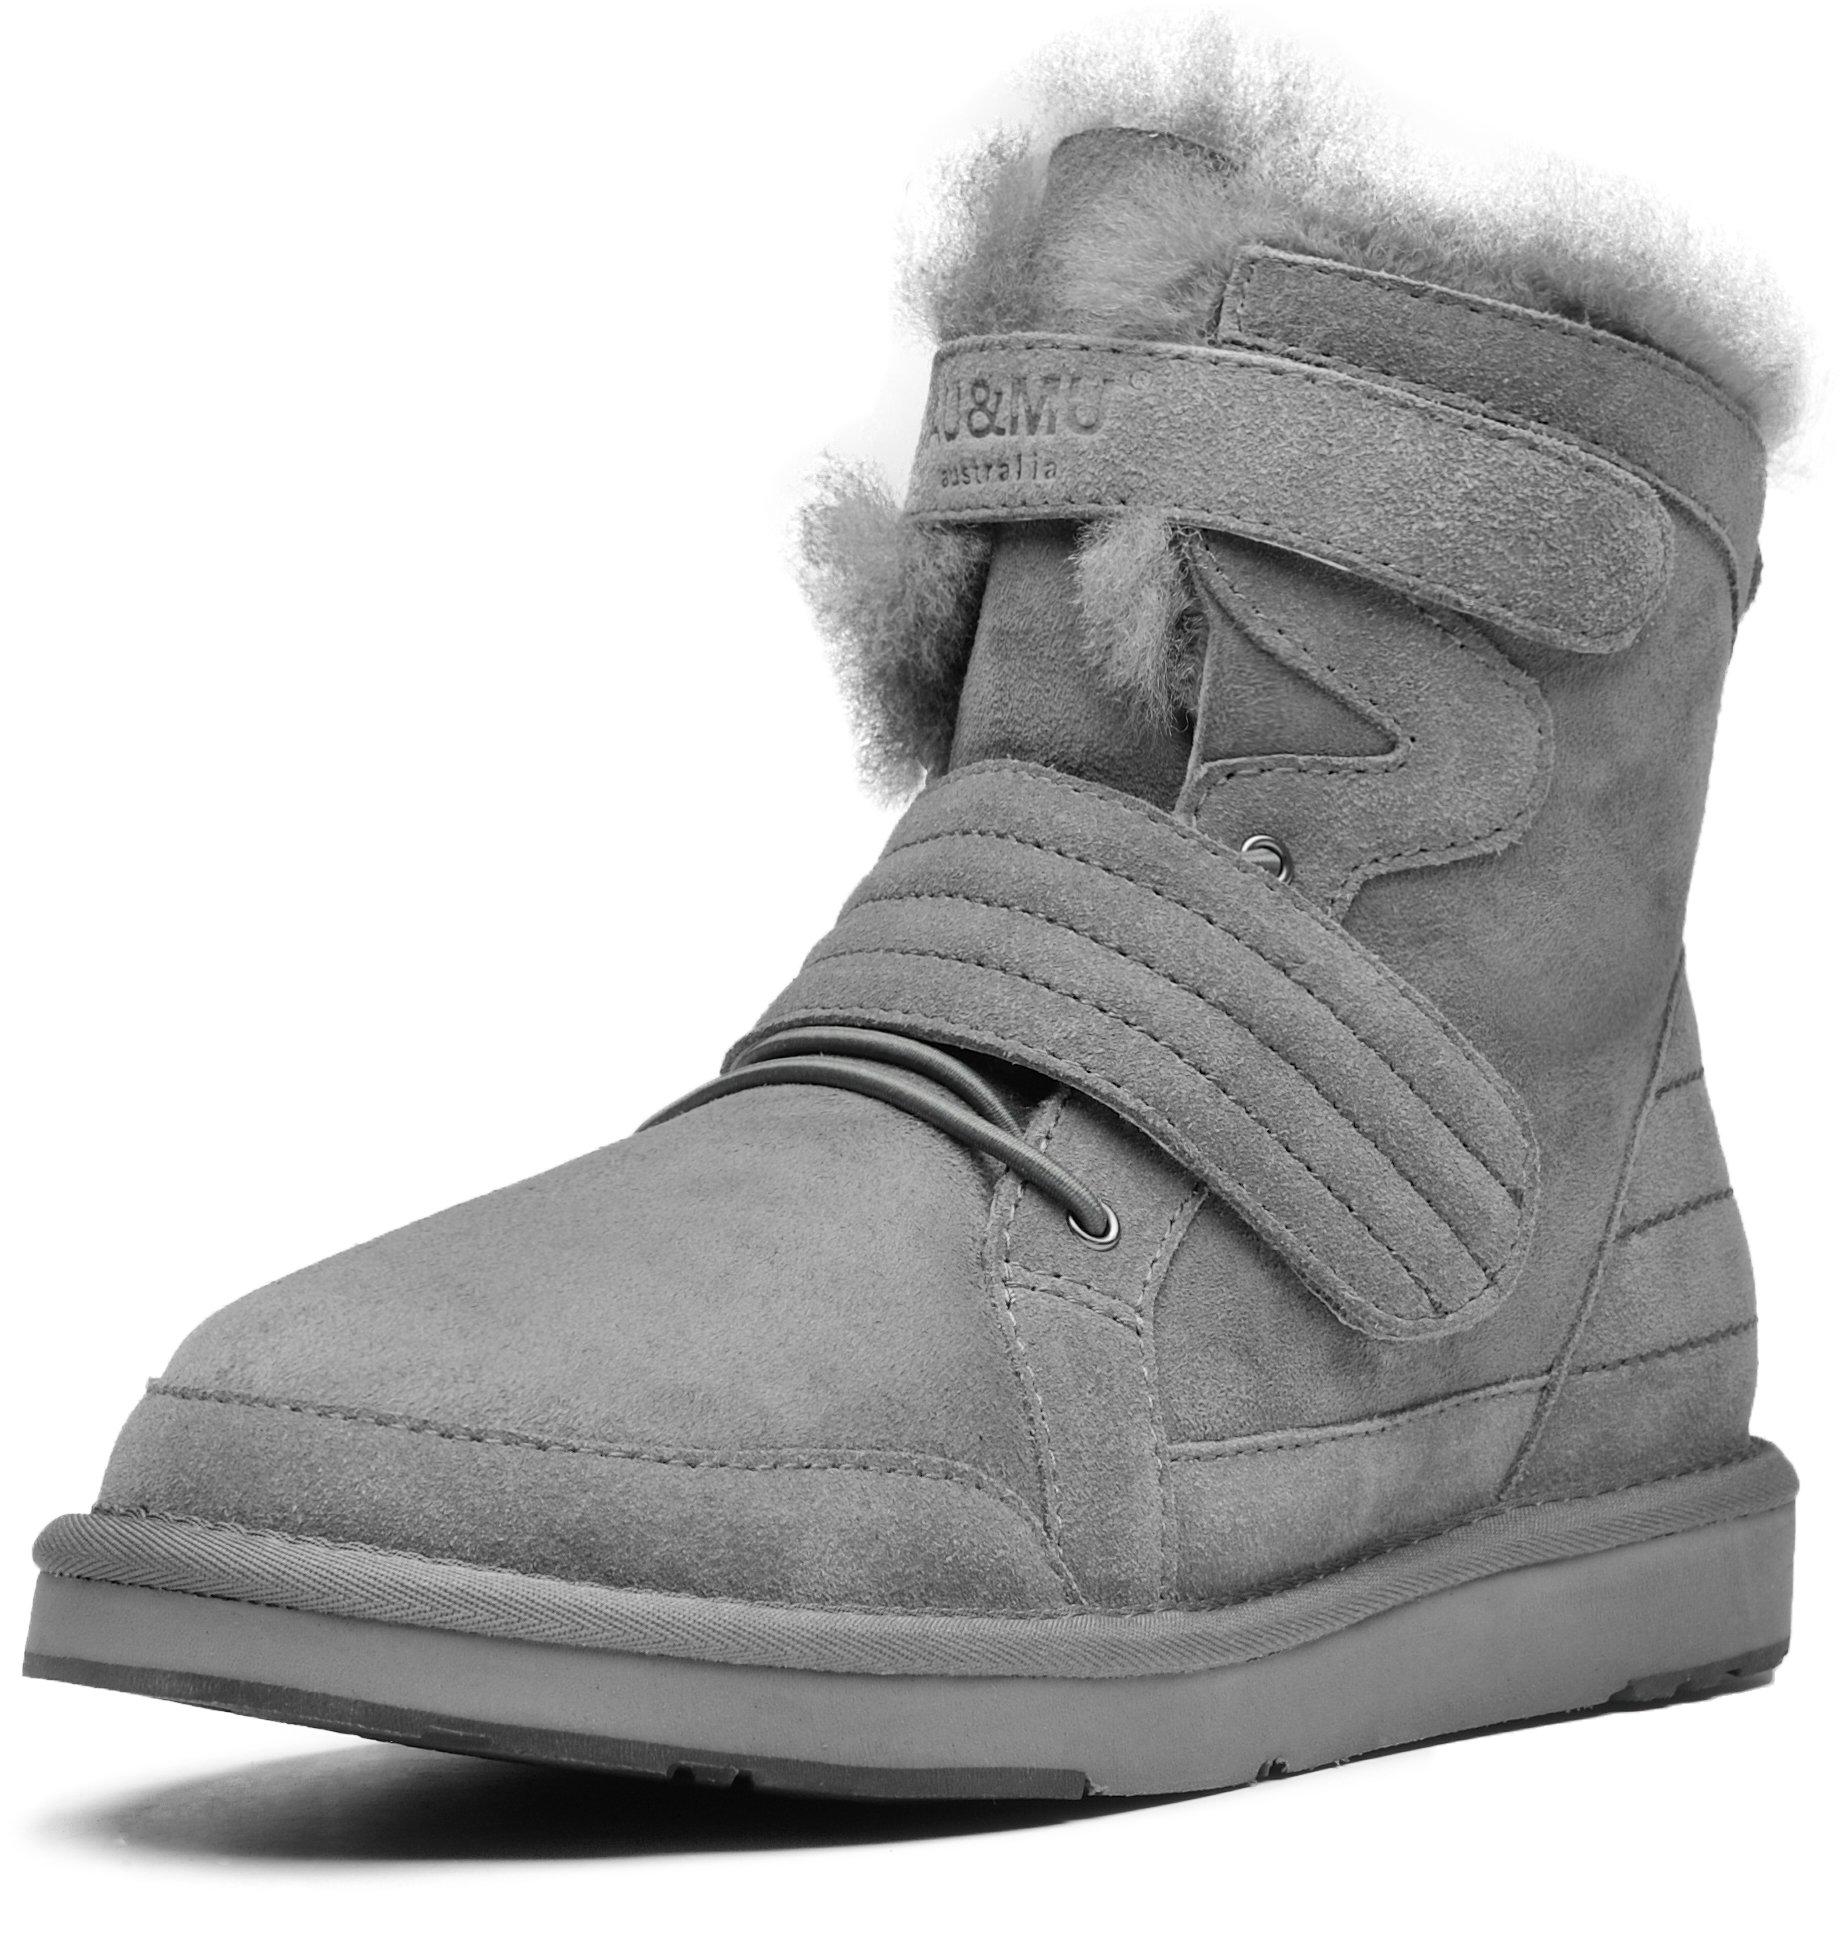 AUMU Classic Short Sheepskin Suede Winter Boots Grey Size 8 by AU&MU